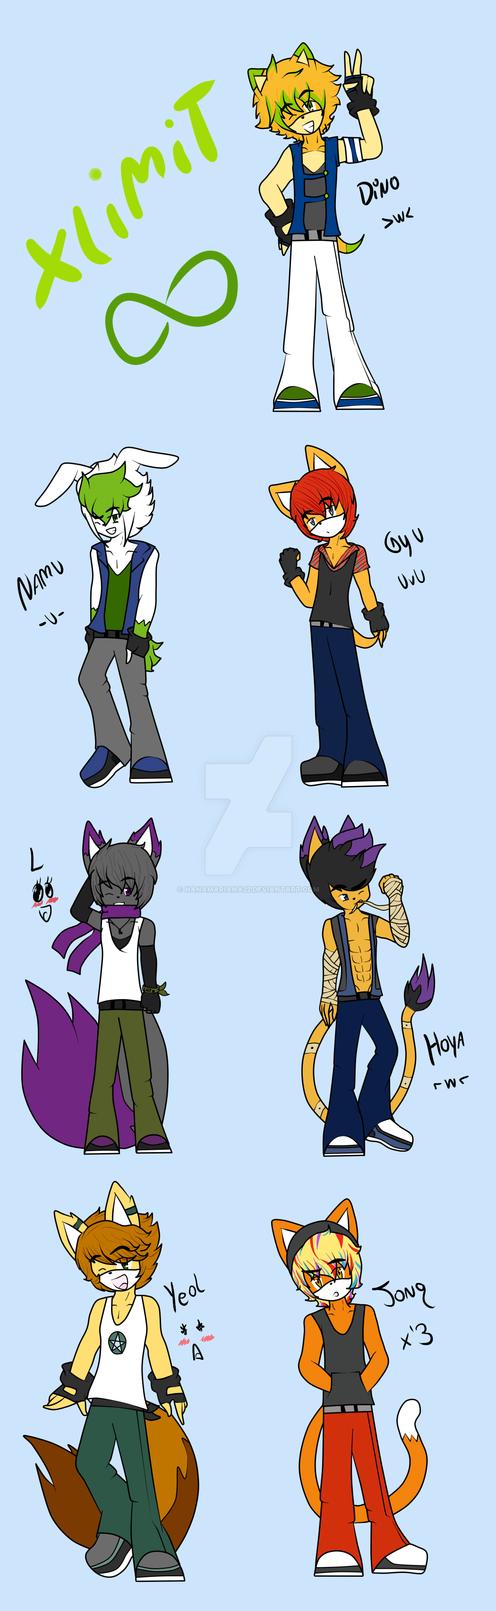 Xlimit .:new looks:. by NanaMariana22